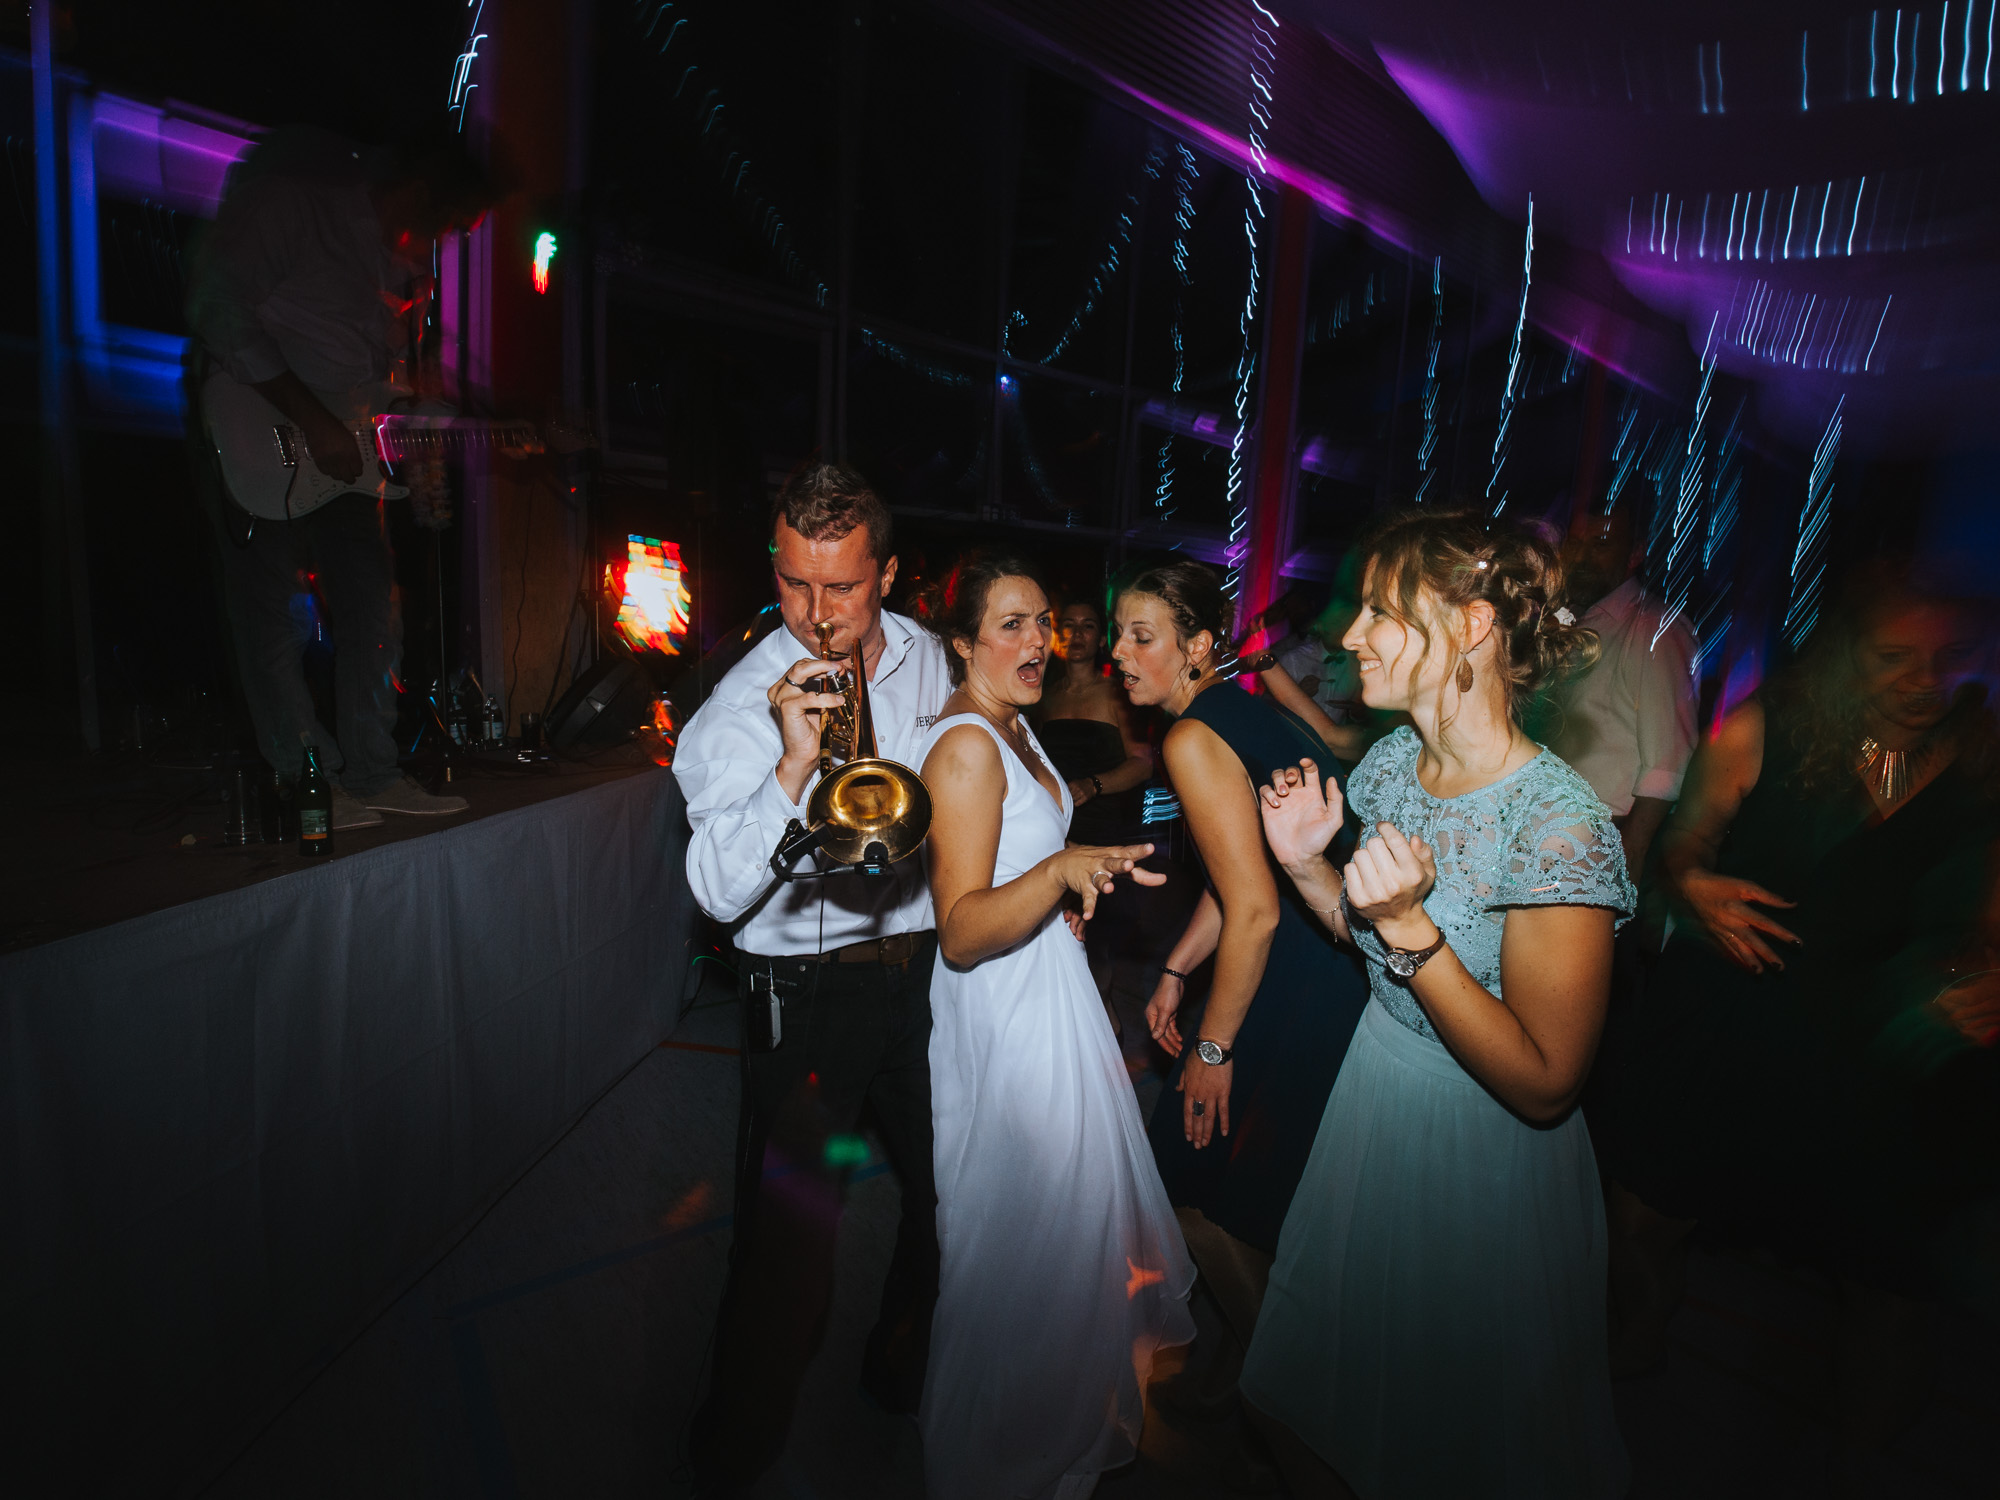 Hochzeit-Memory-factory-20170910-0045.jpg